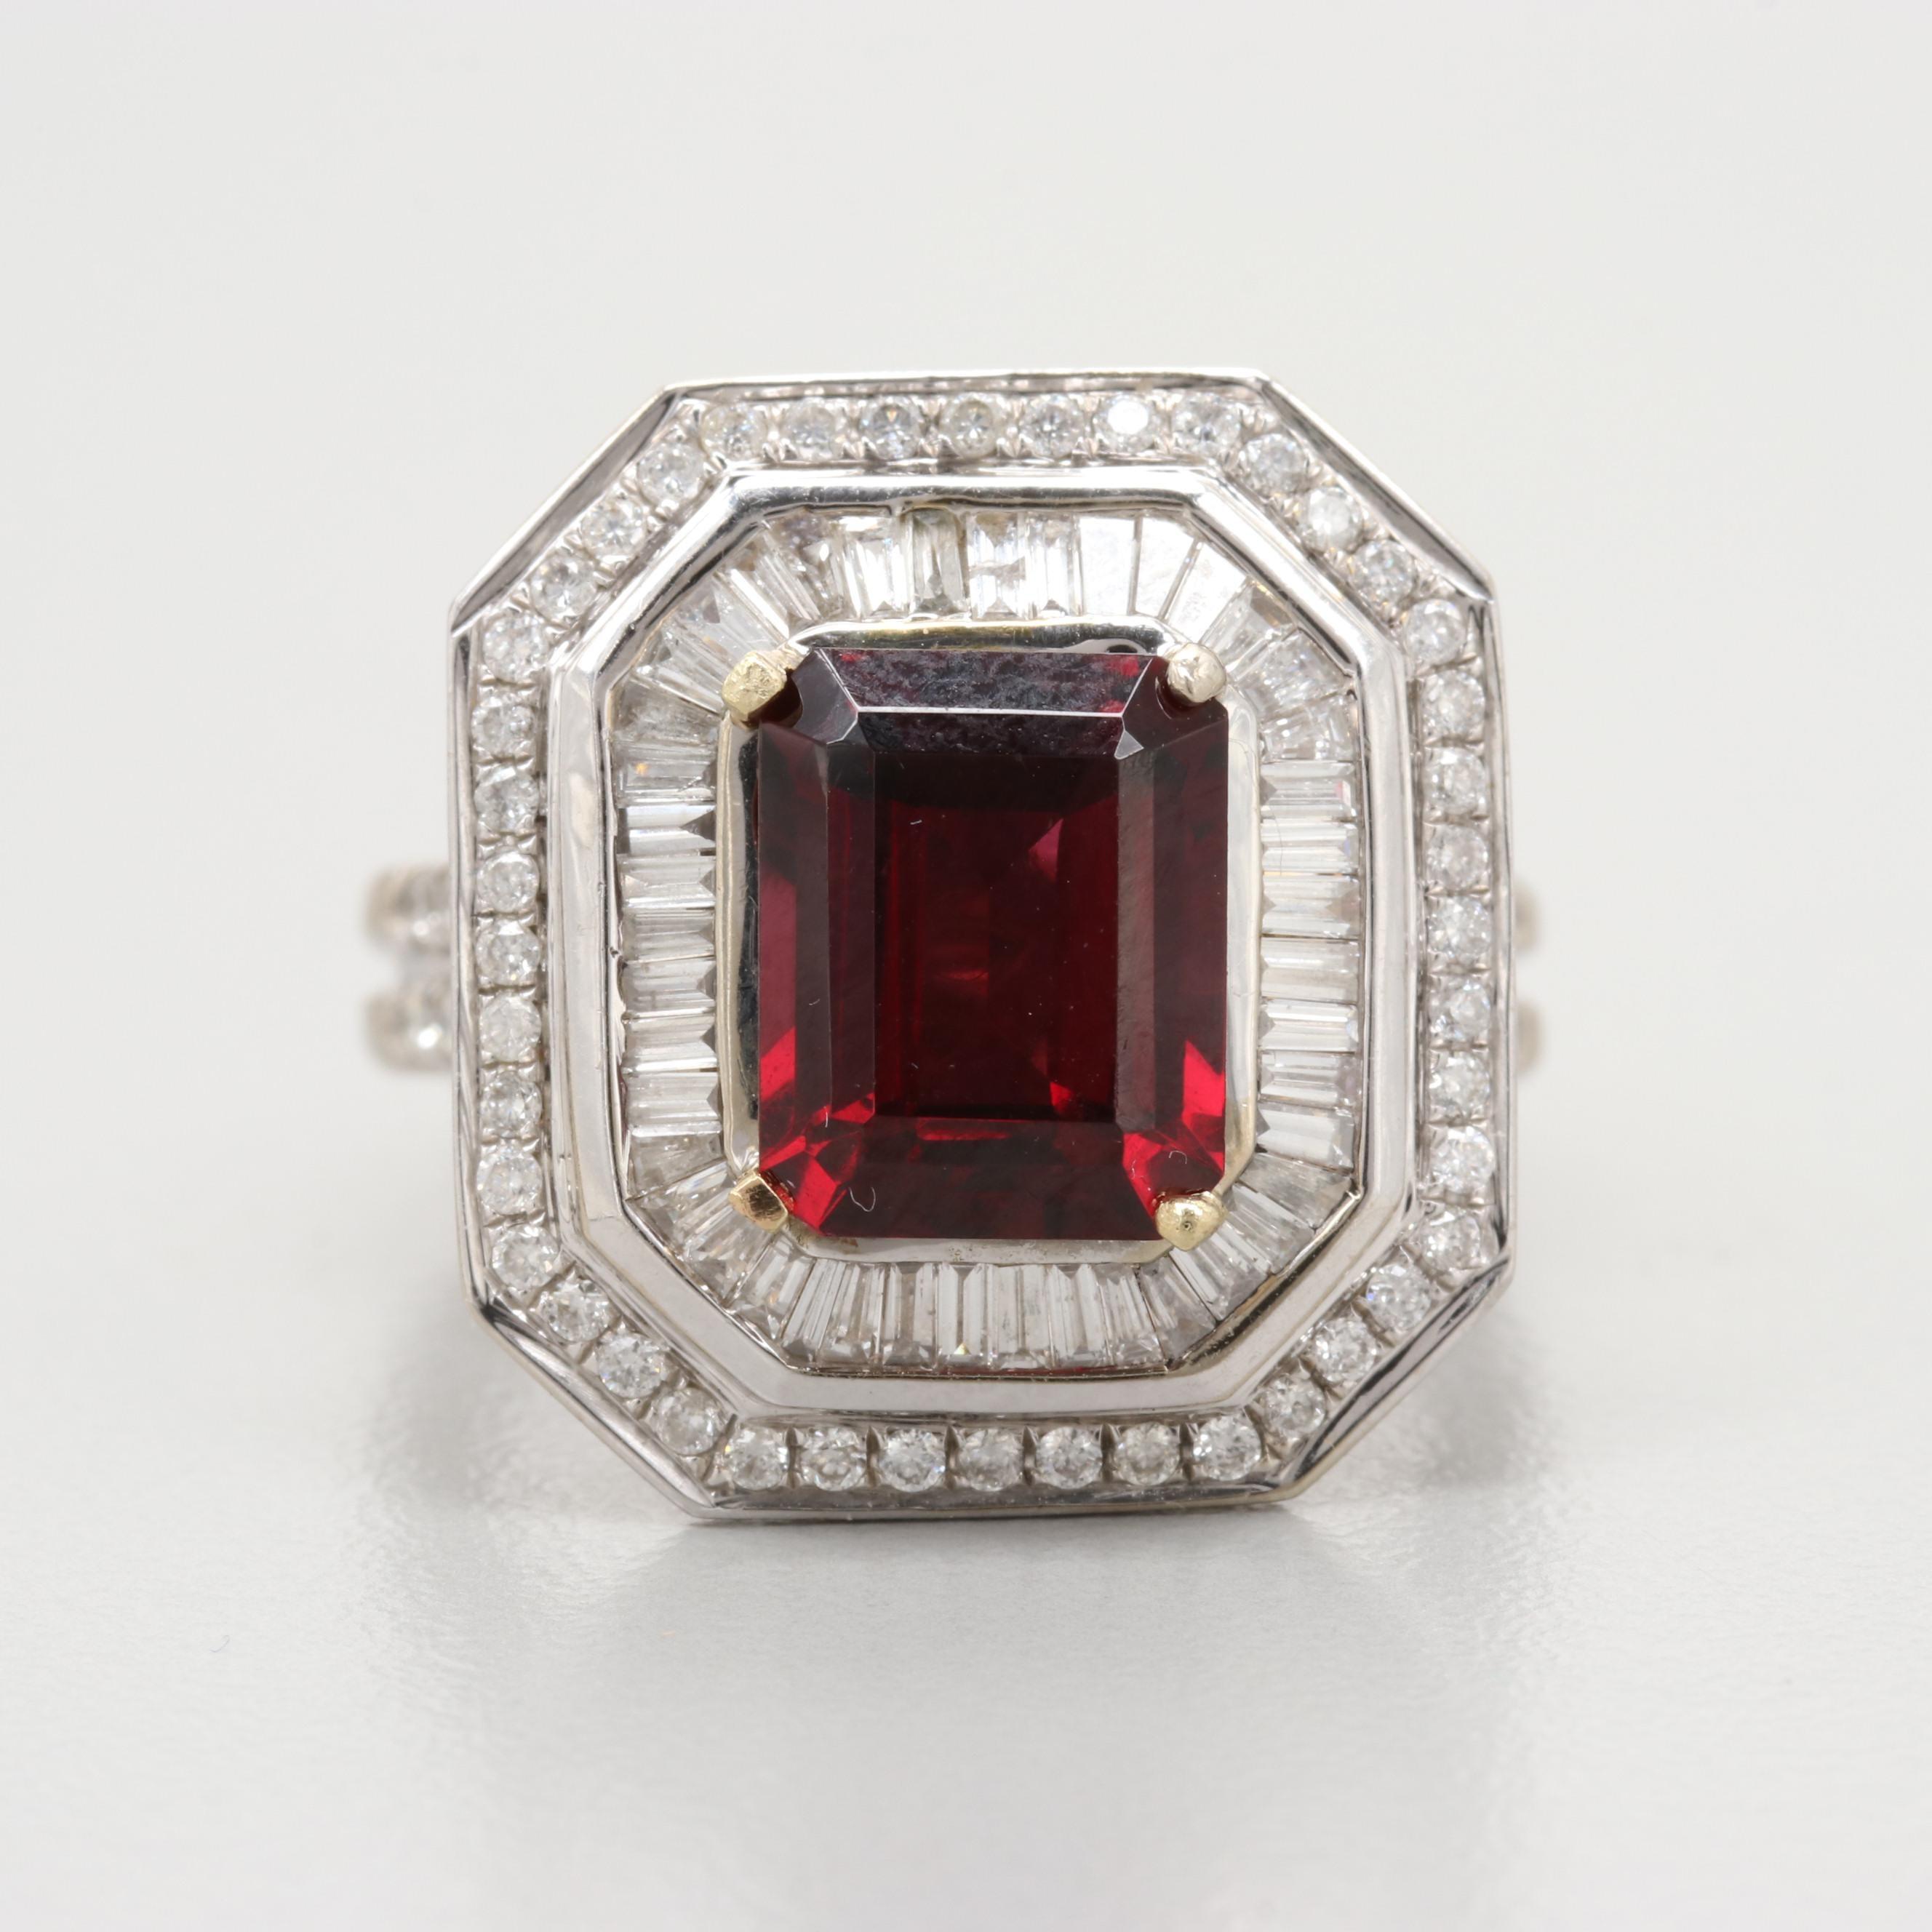 14K White Gold Garnet and 1.94 CTW Diamond Ring